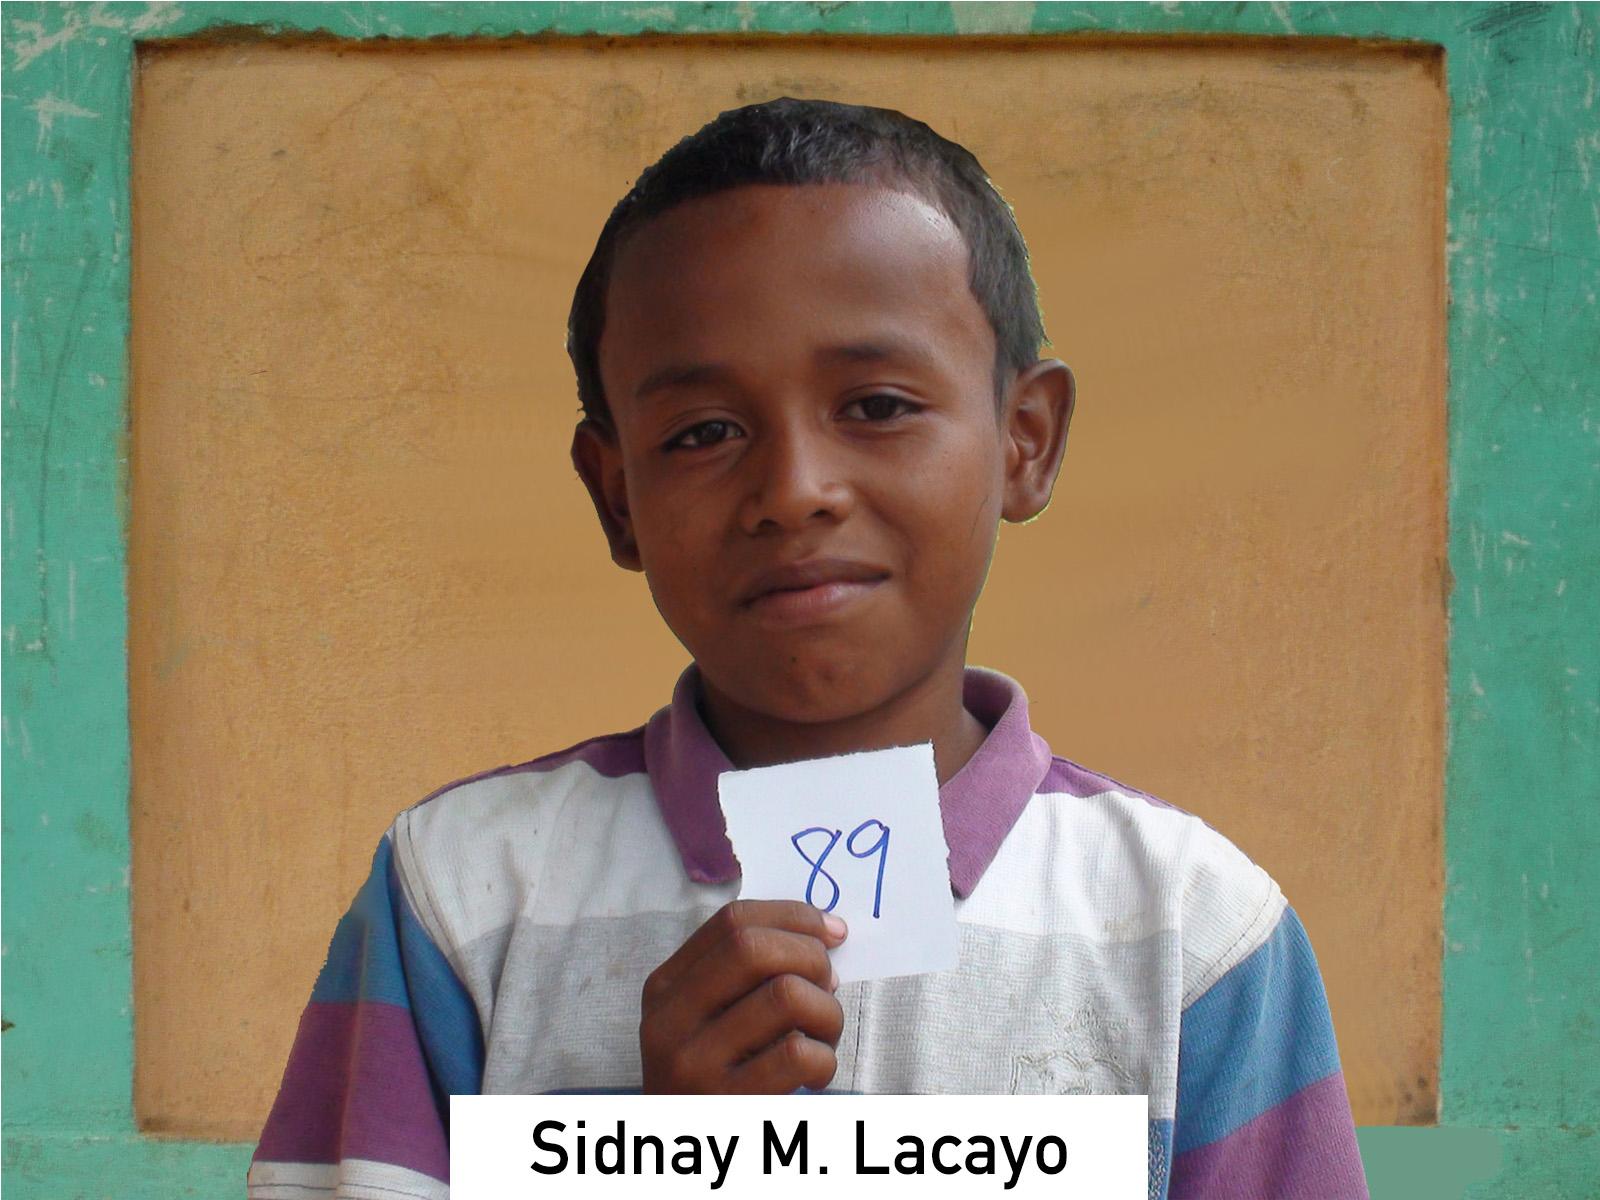 089 - Sidnay M. Lacayo.jpg